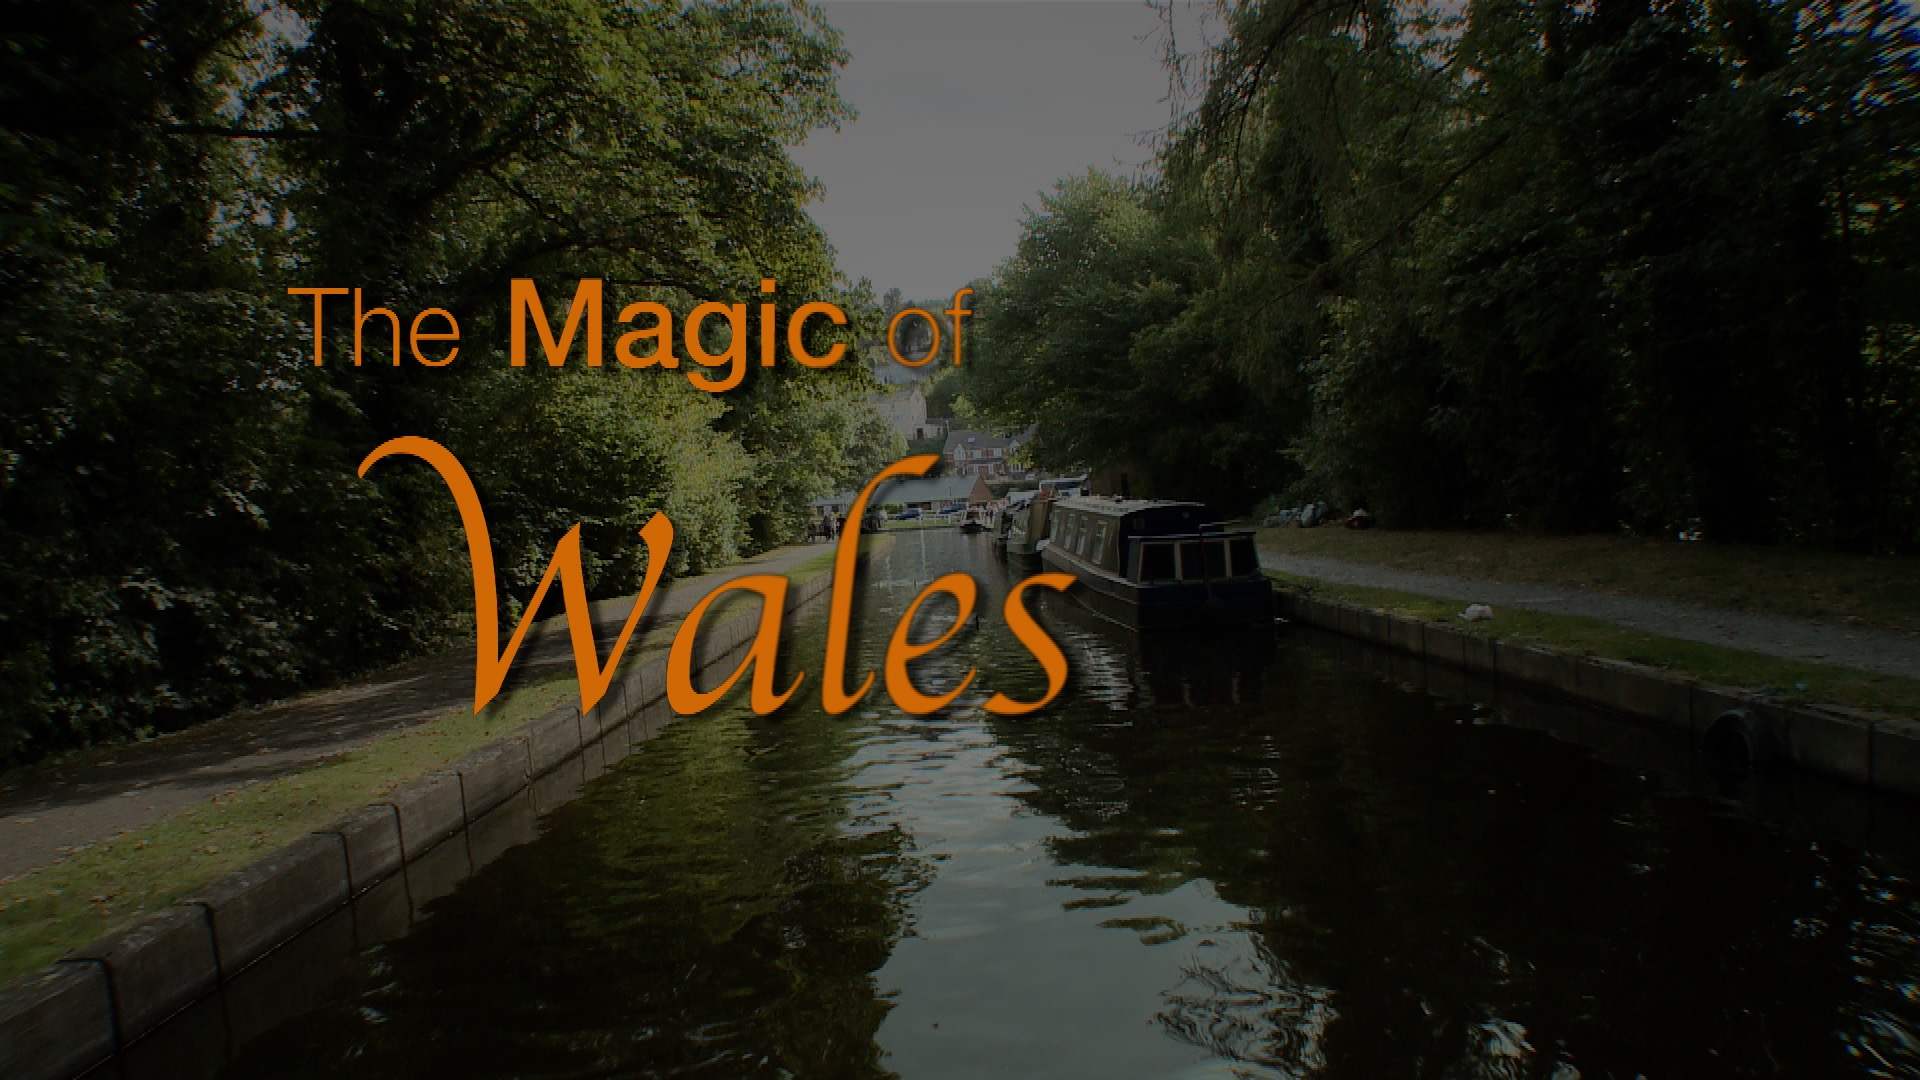 The Magic of Wales.jpg